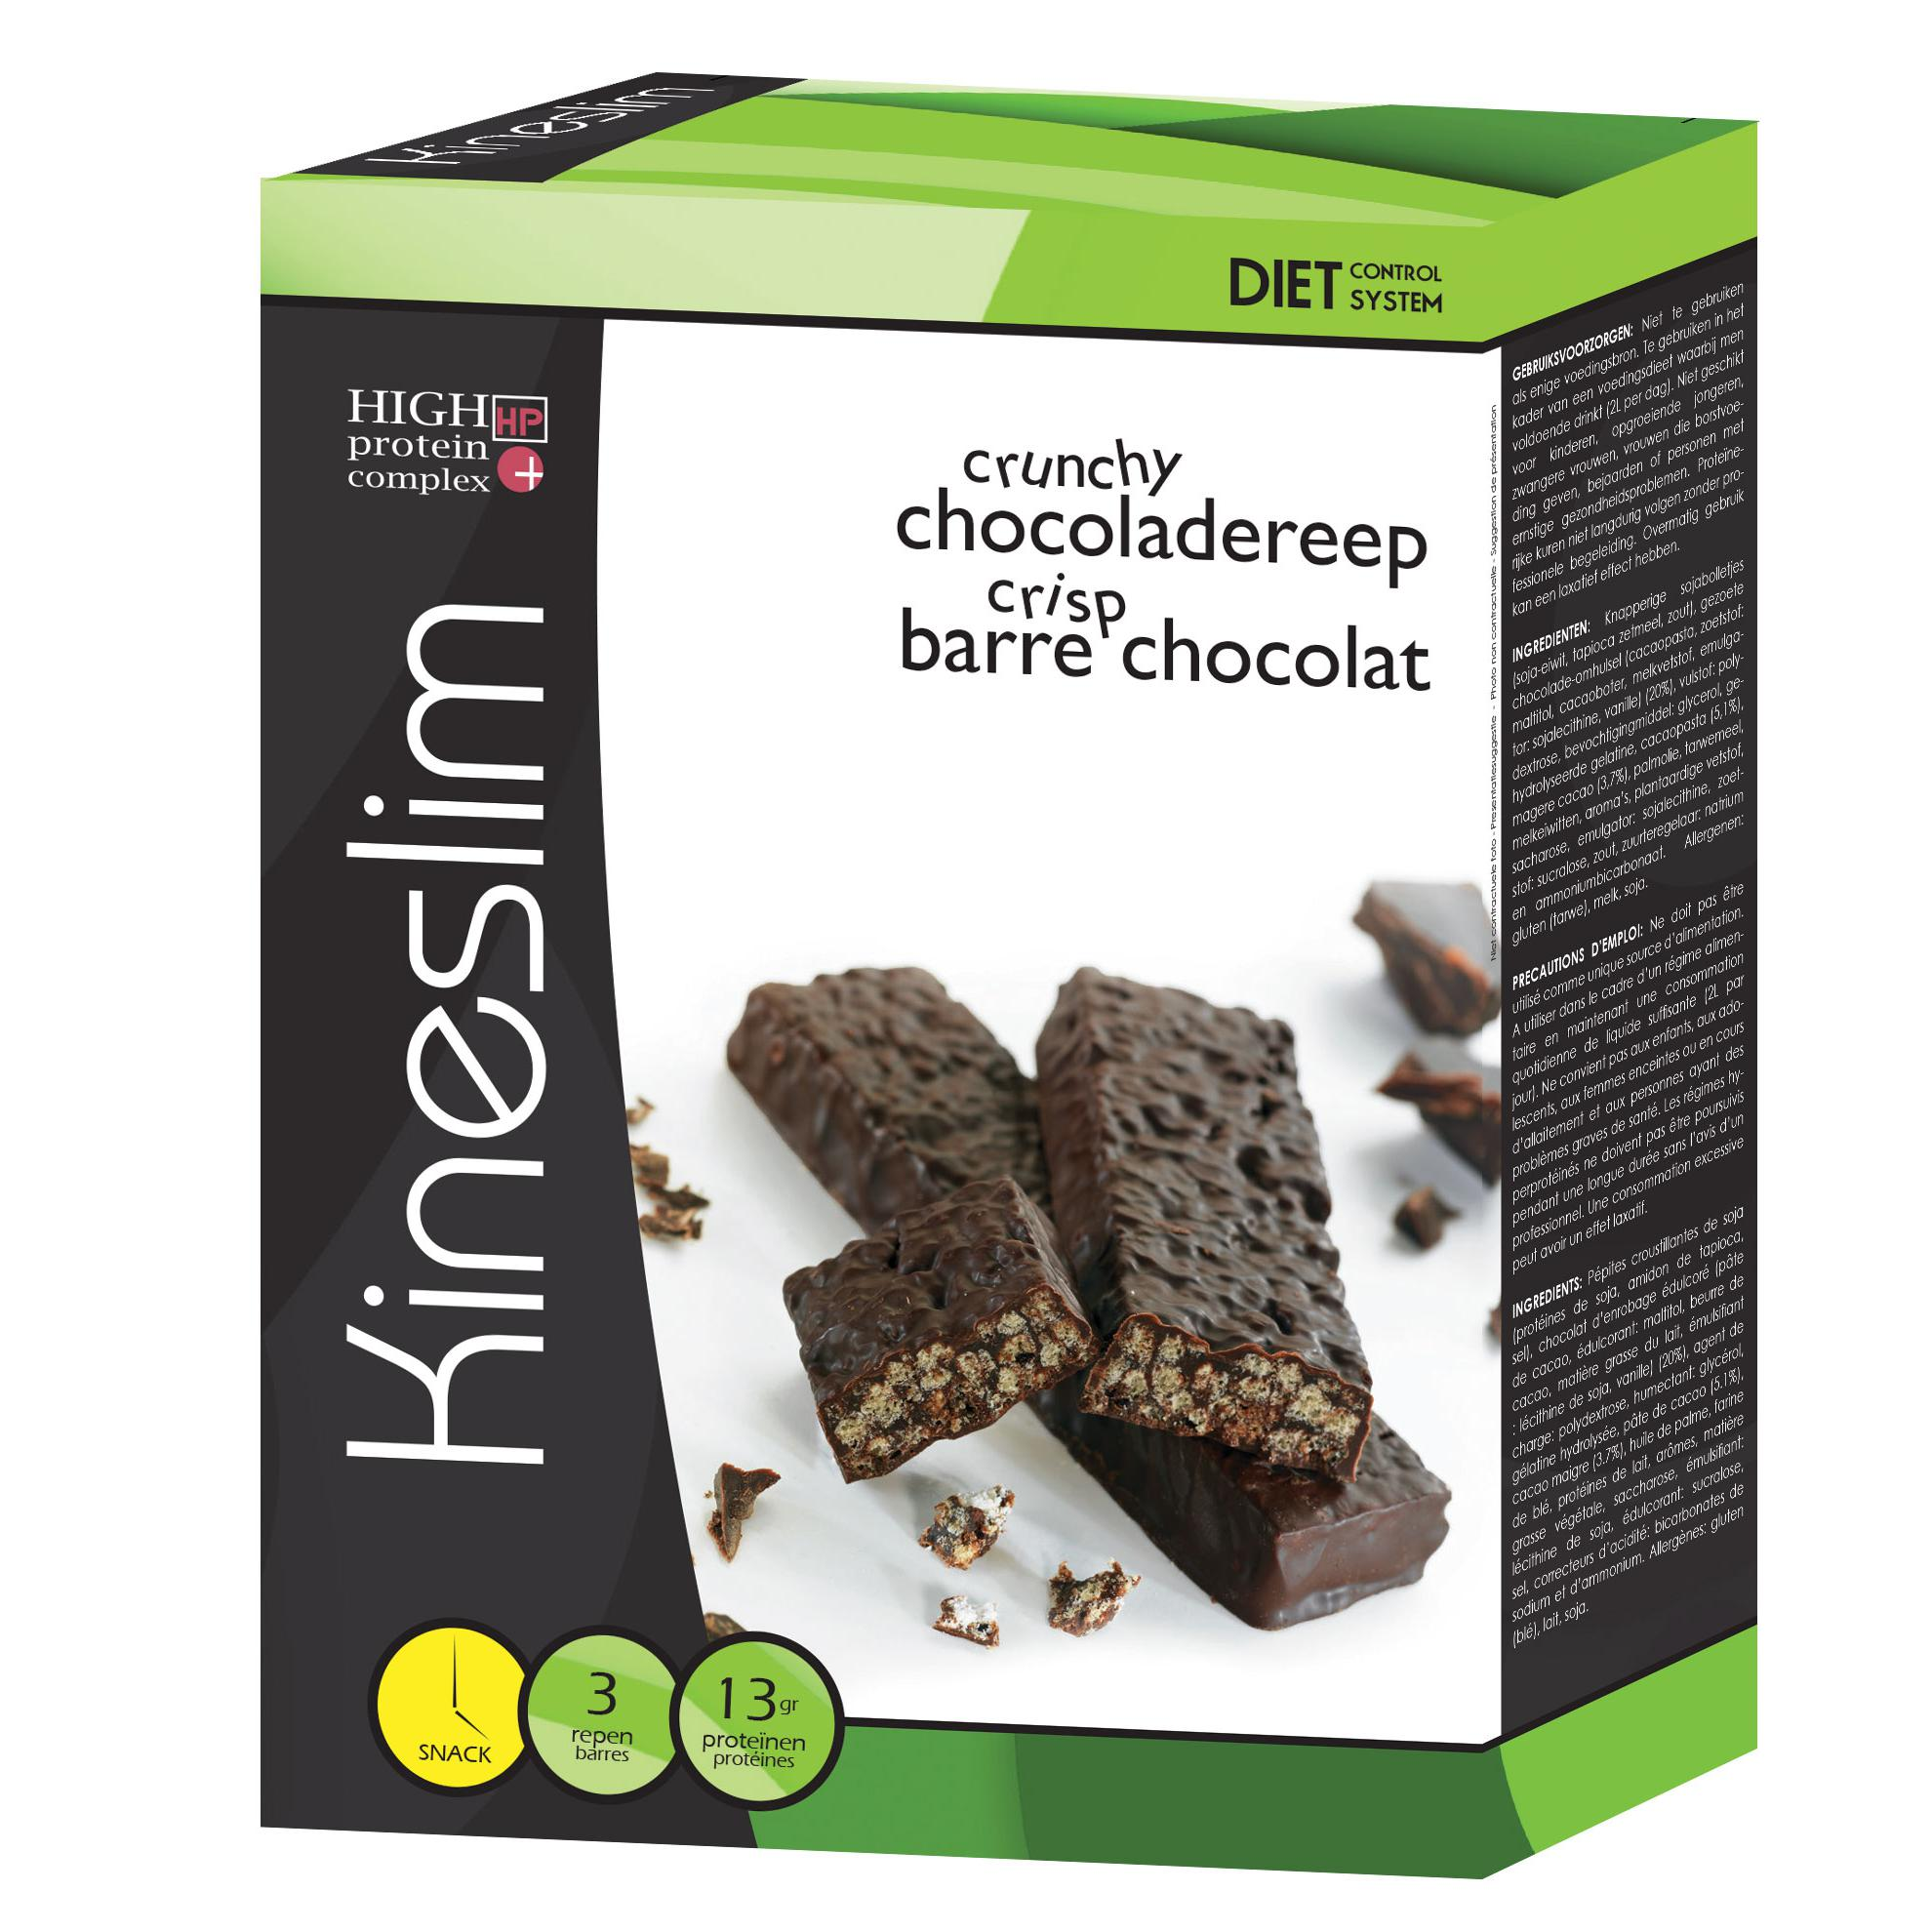 Image of Kineslim barres crisp chocolat